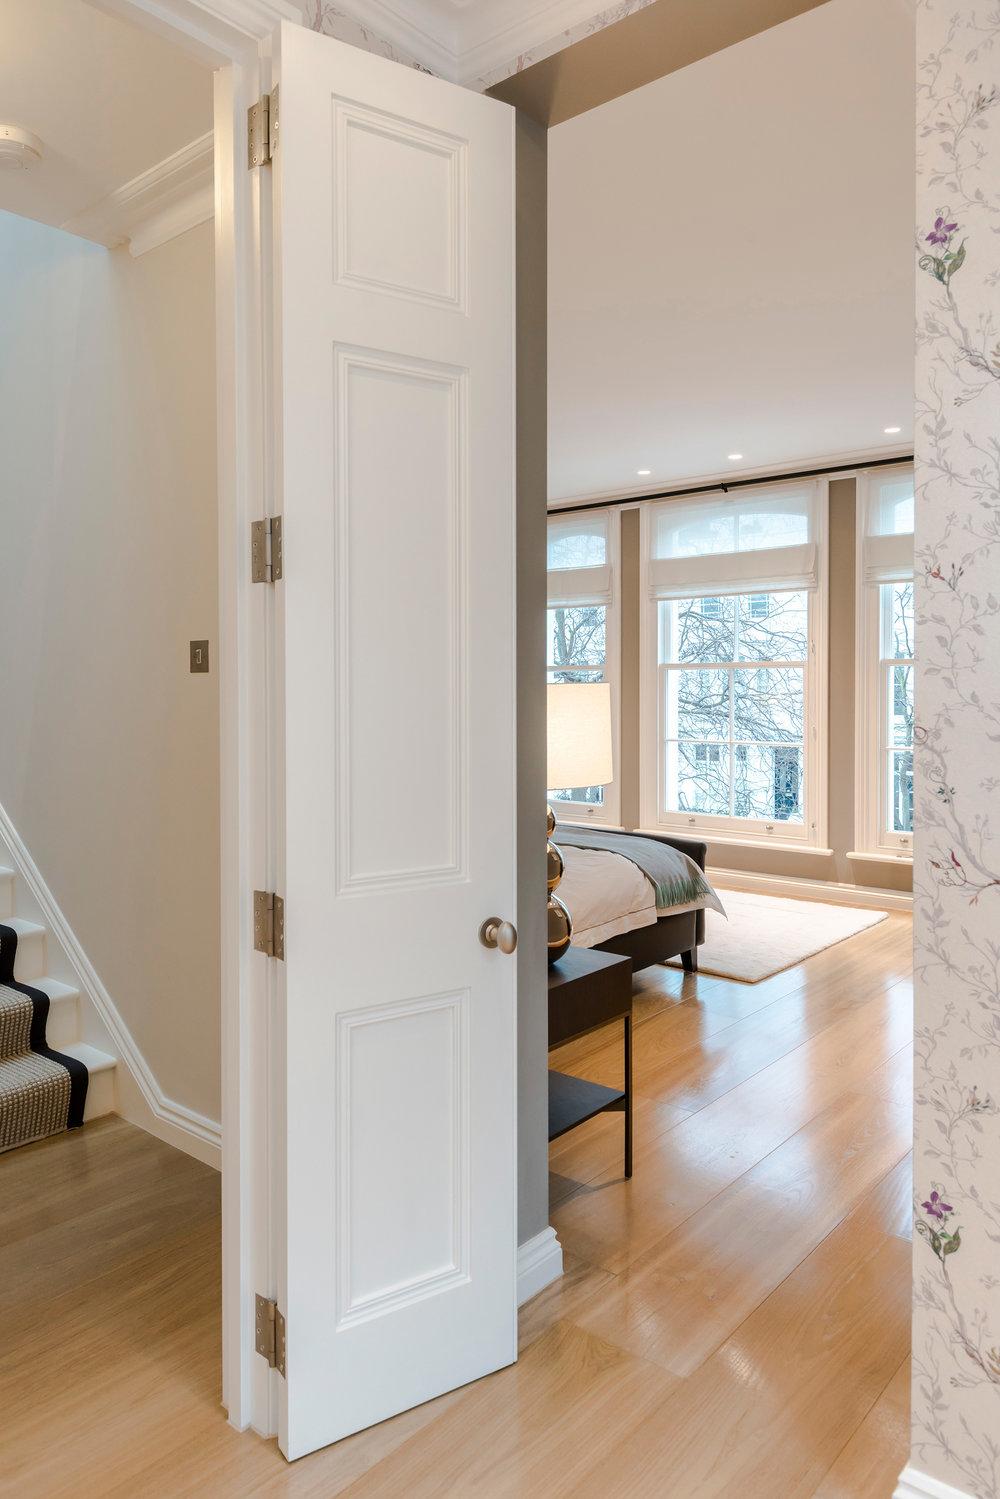 Studio 29 residential architects refurbishment kensington 5